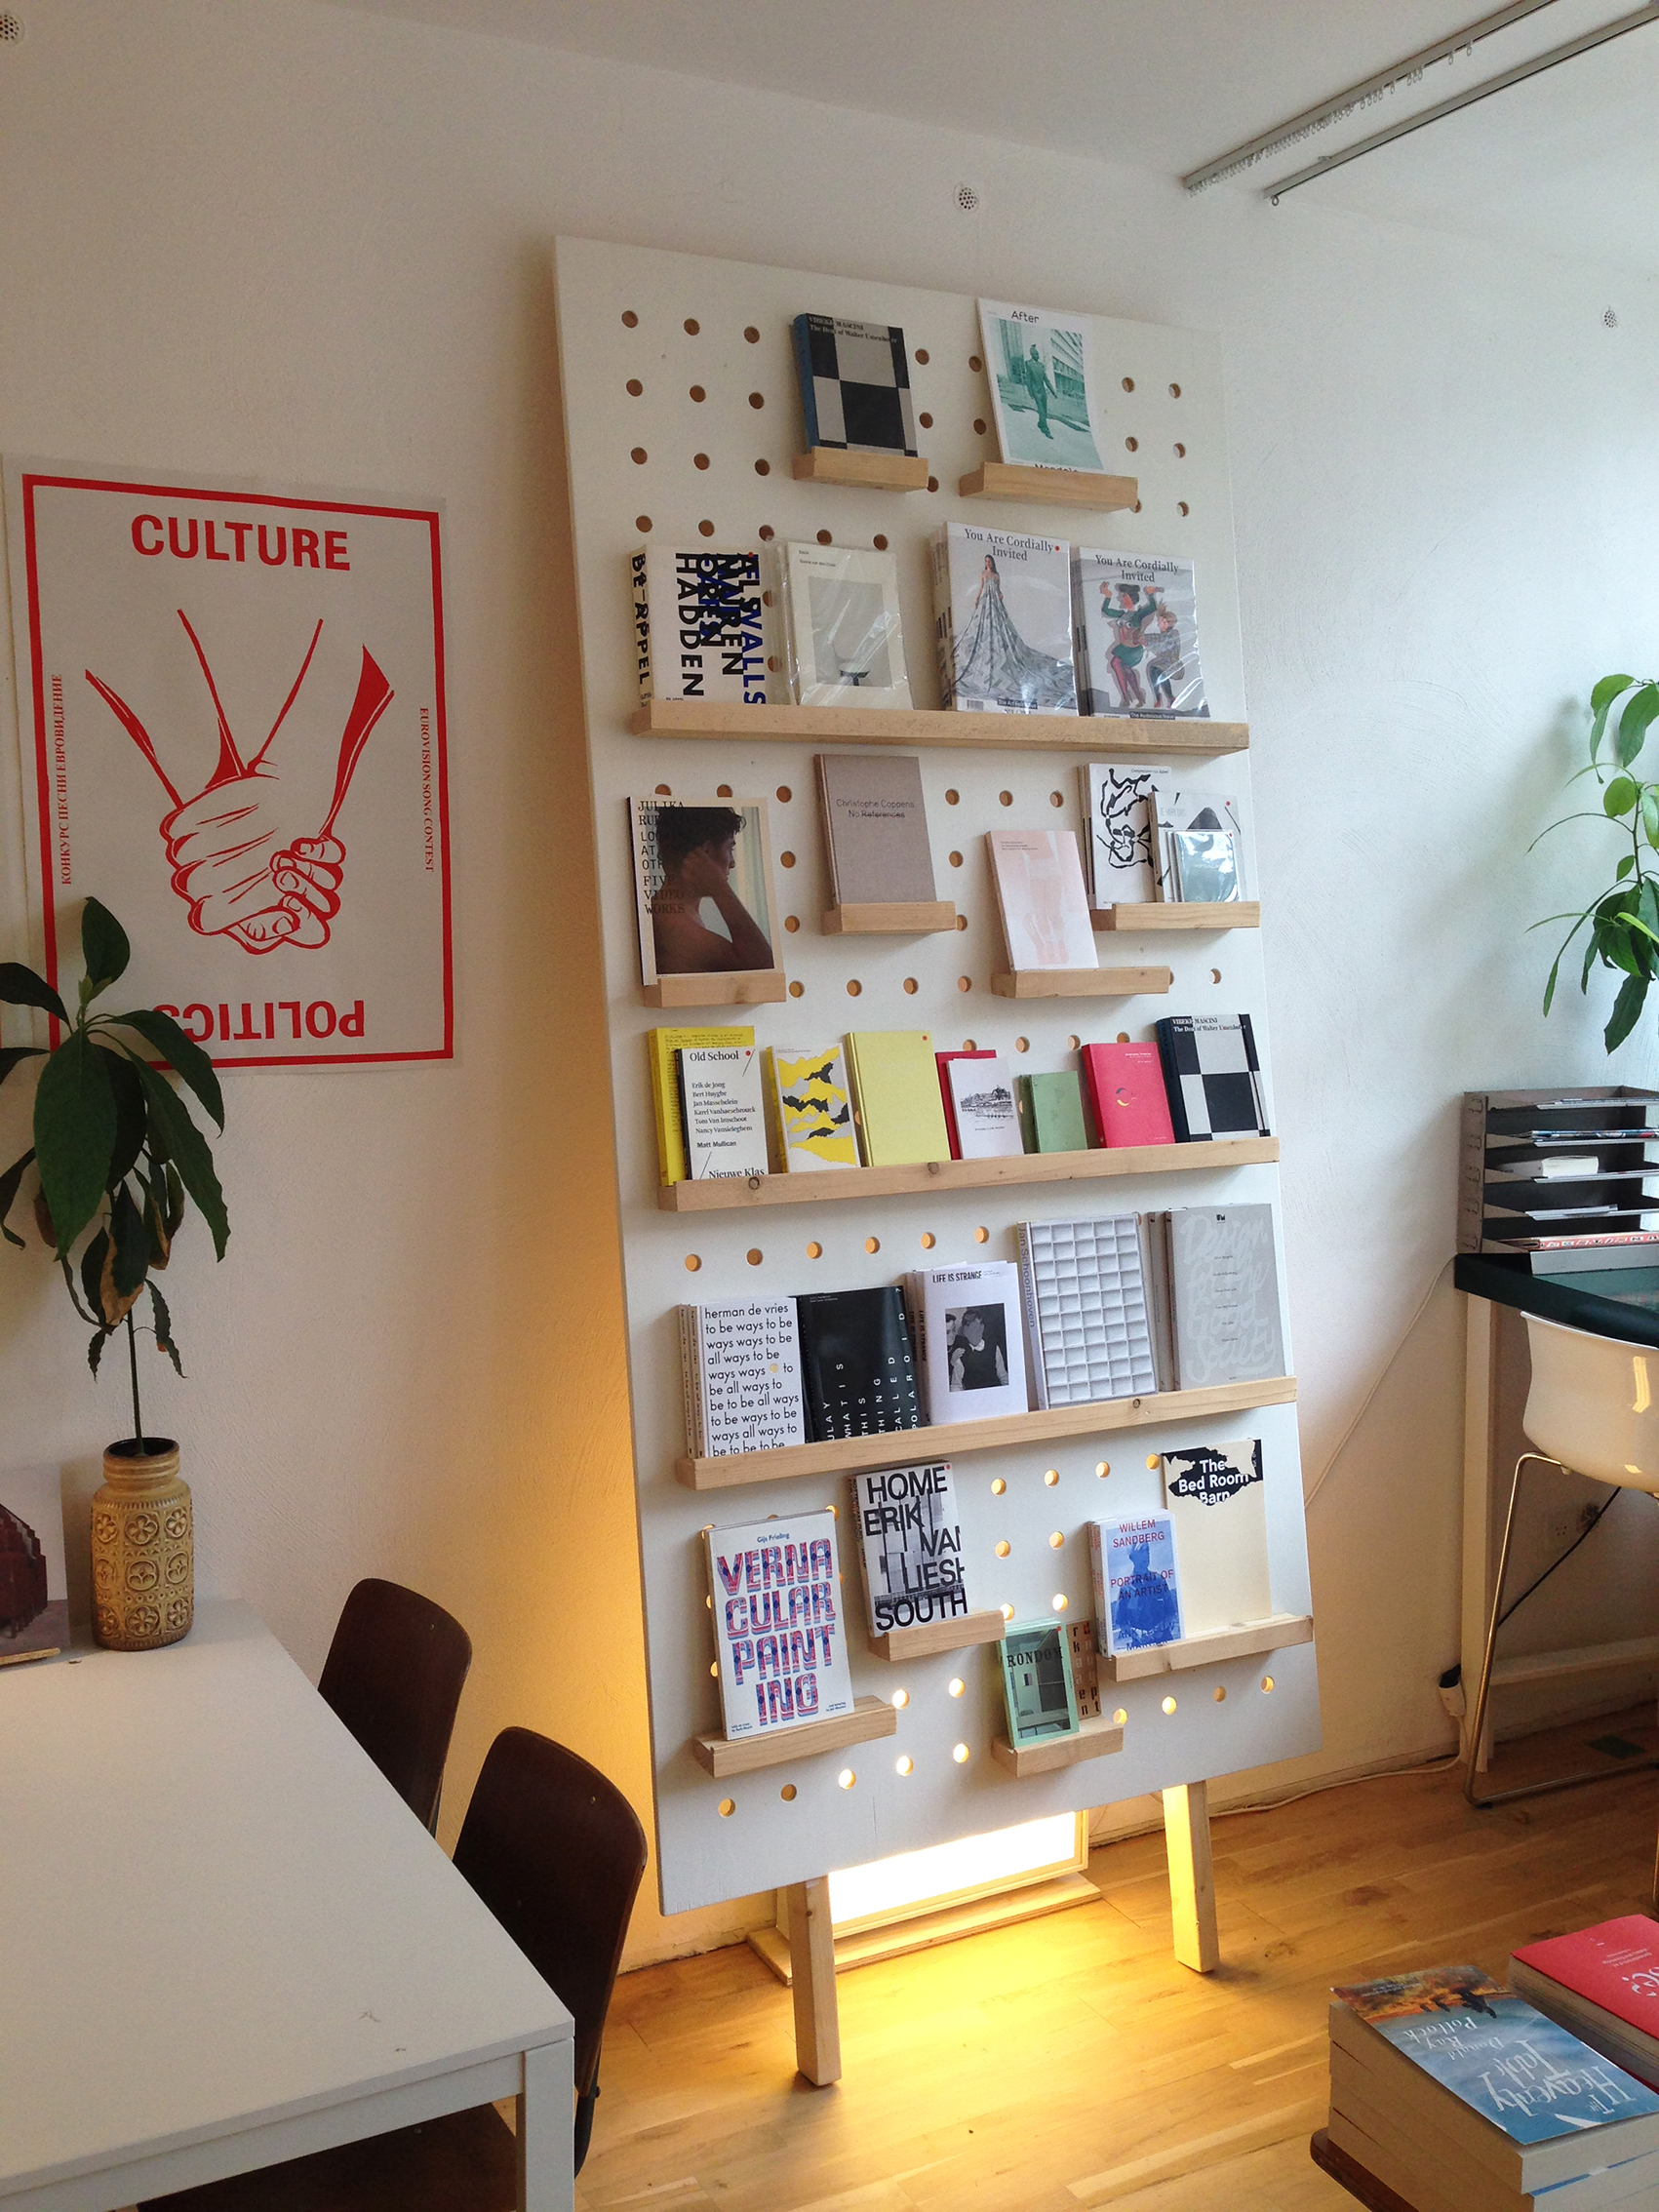 displays en wanddisplay voor het interieur van boekenwinkel Walter in Arnhem / displays and walldisplay for the bookstore Walter in Arnhem